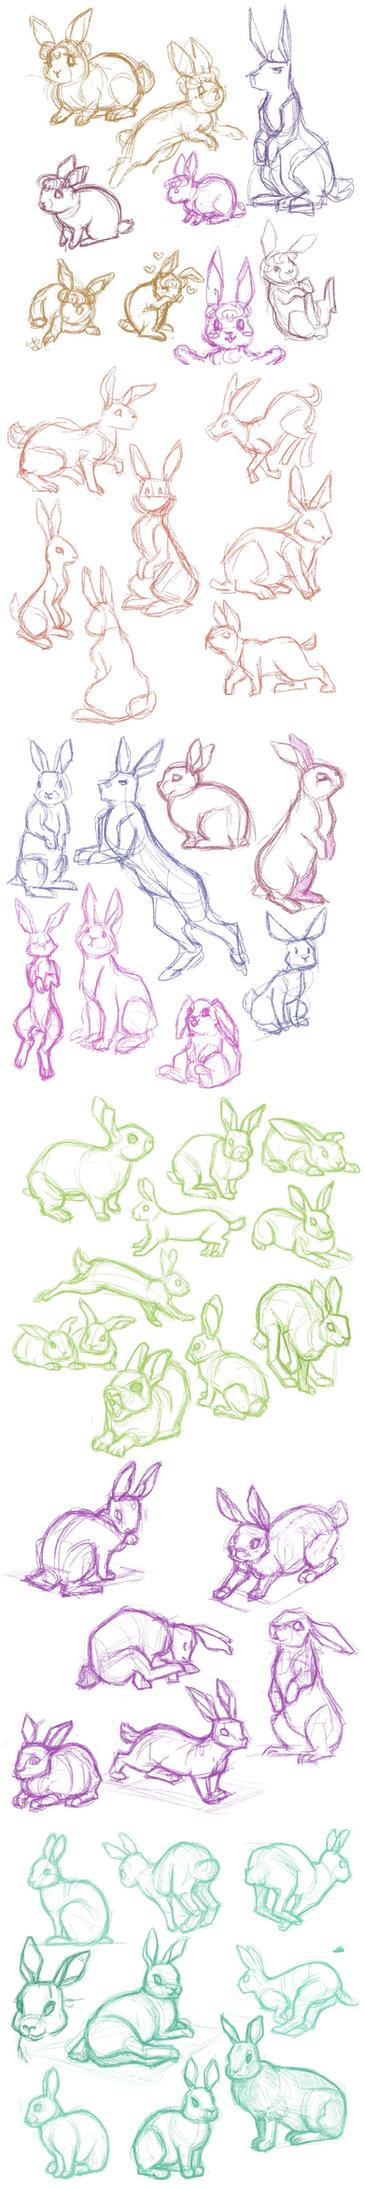 Bunnies by Annorelka